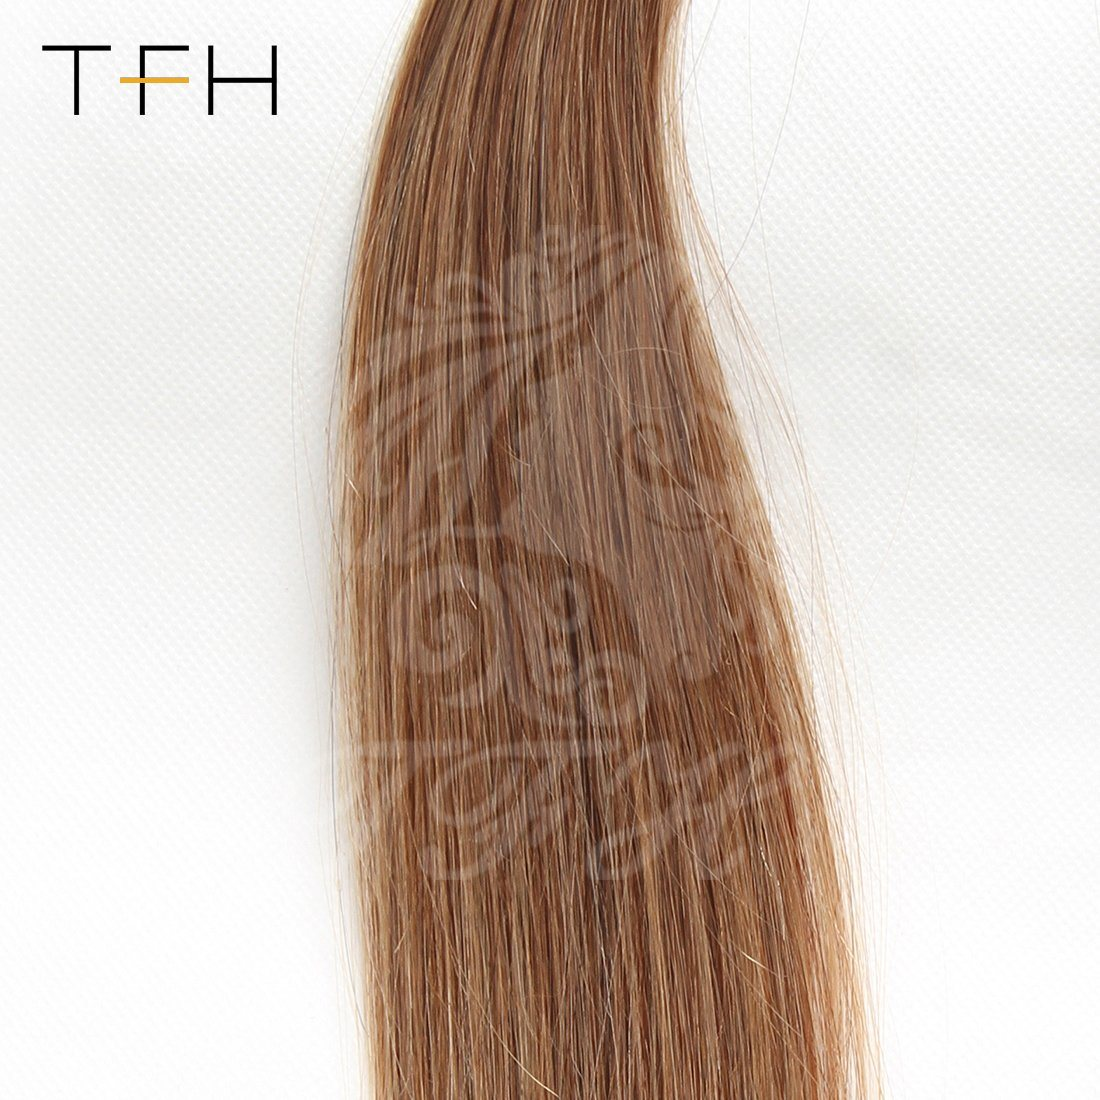 China 10a Straight Fusion Hair I Tip Hair Extension Machine Made